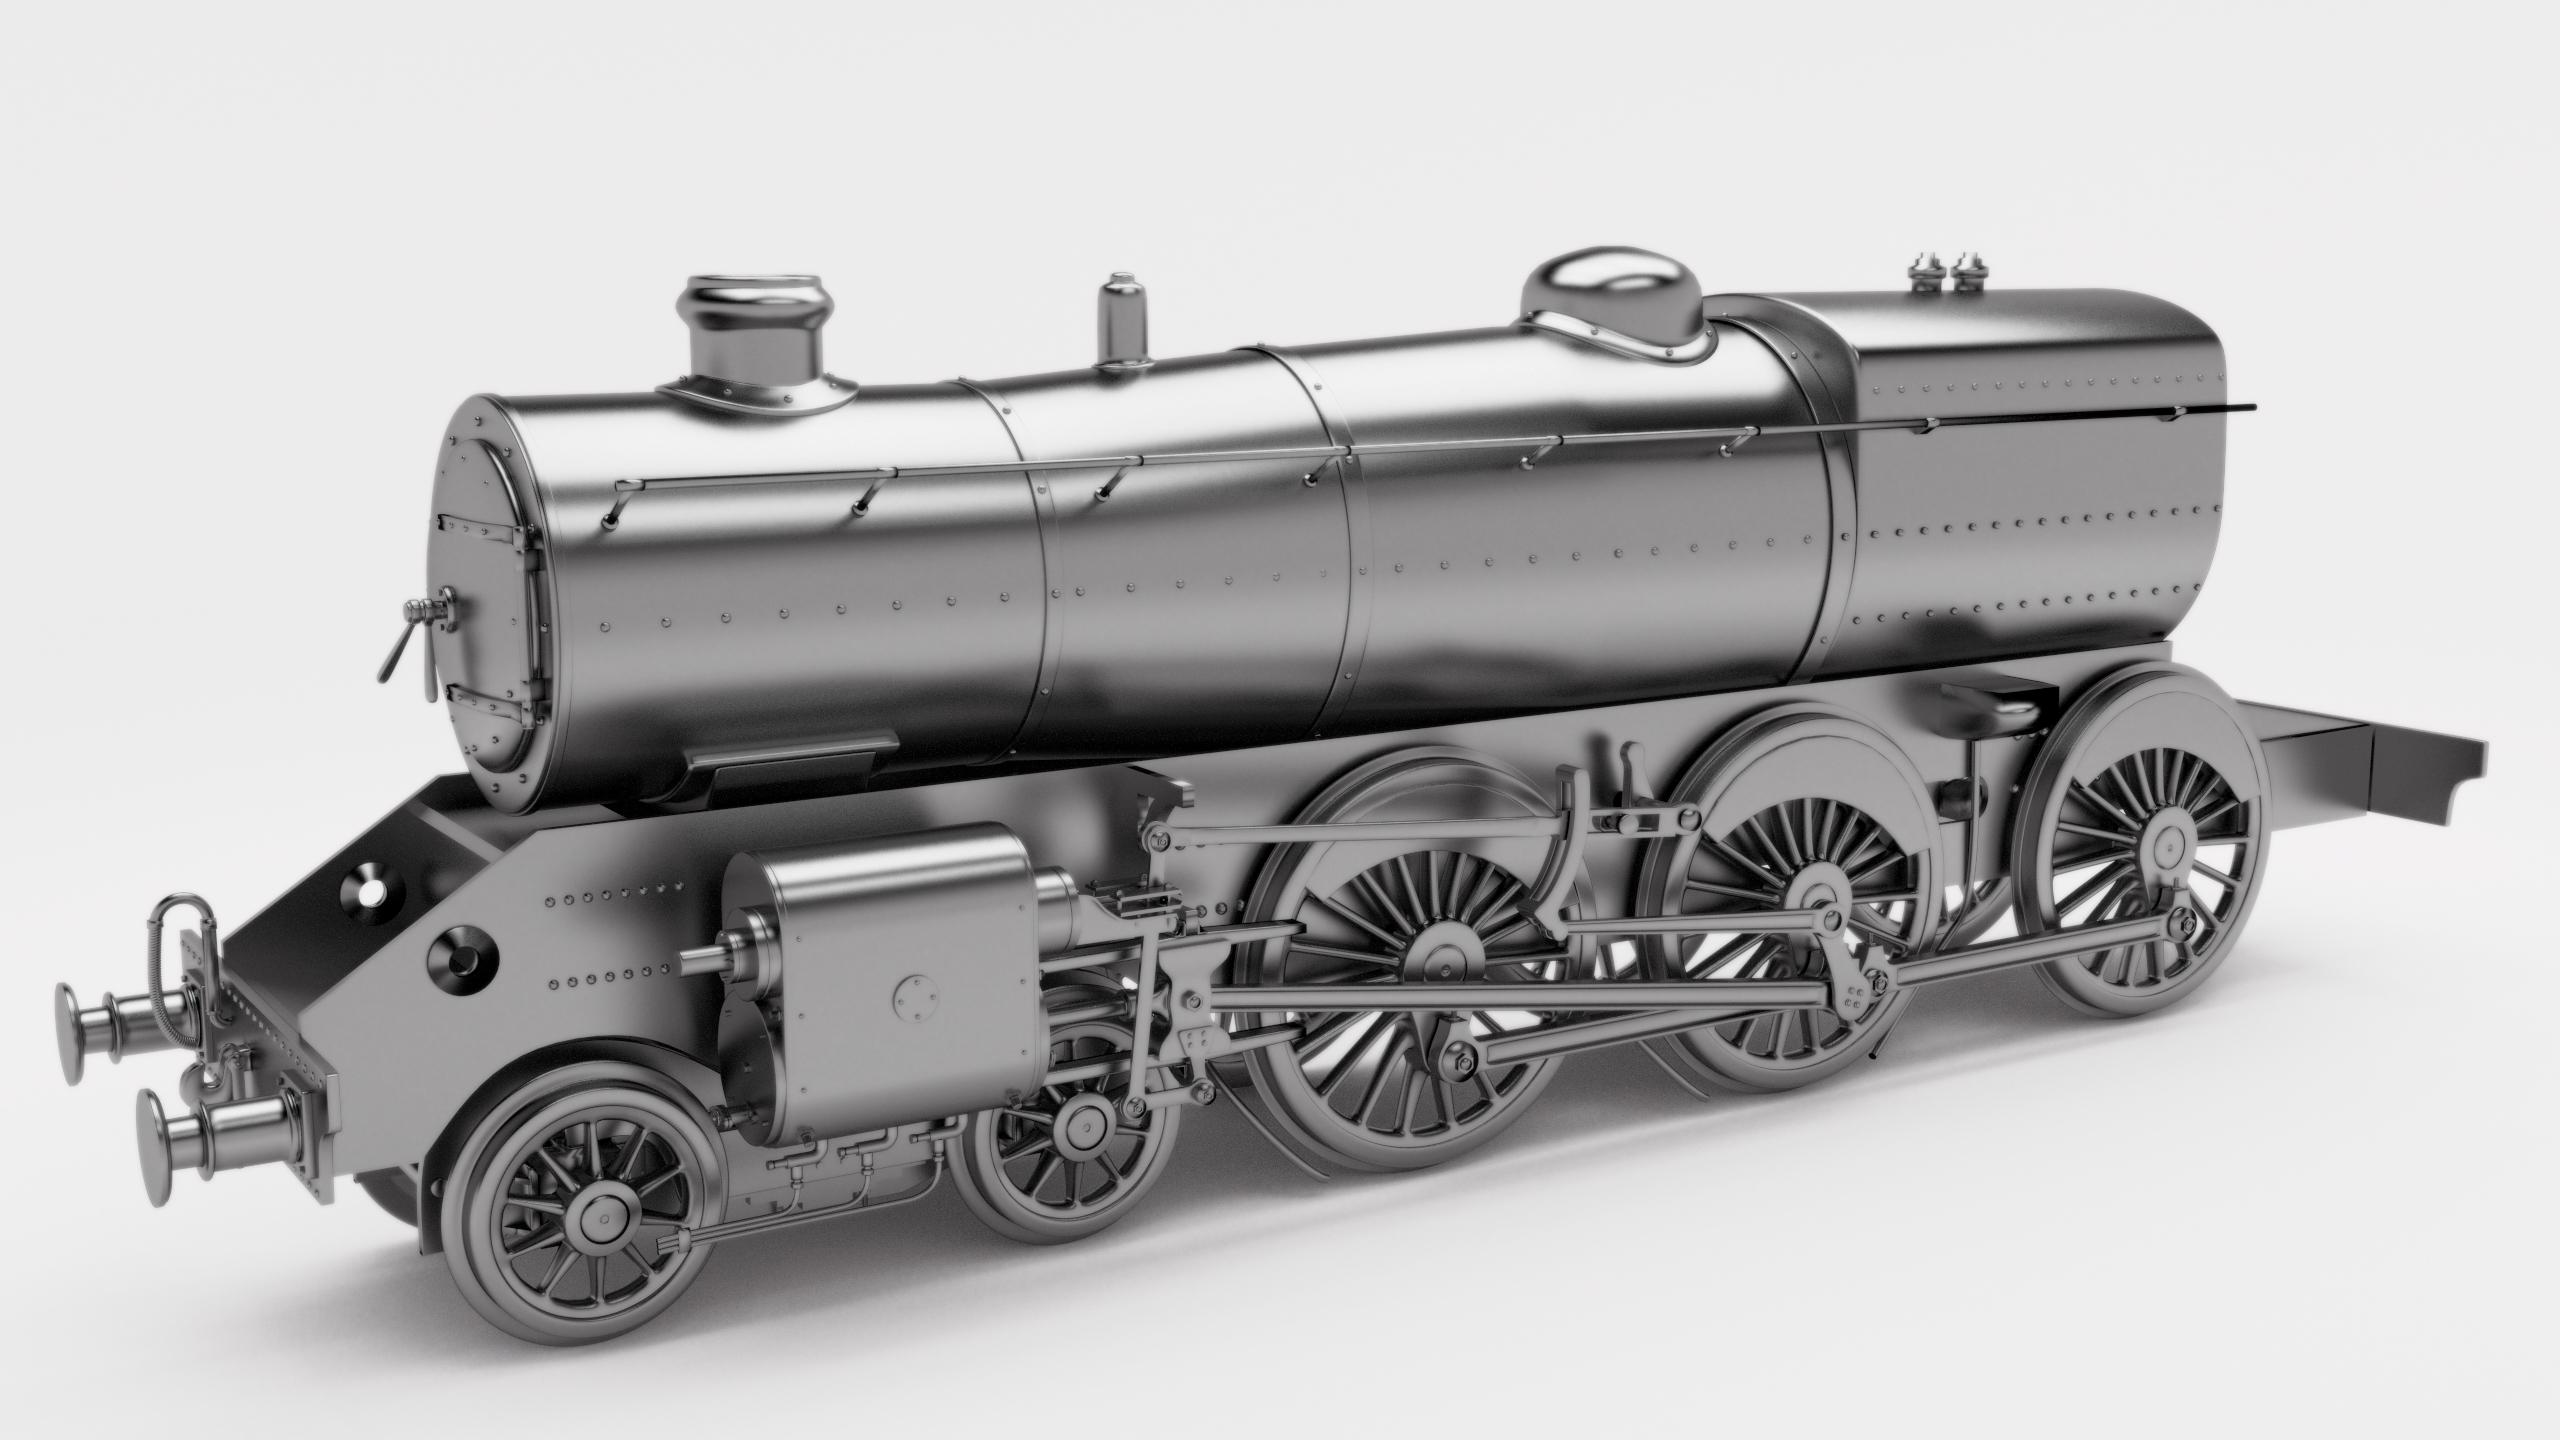 Blender] Locomotora a vapor clase 5 4-6-0